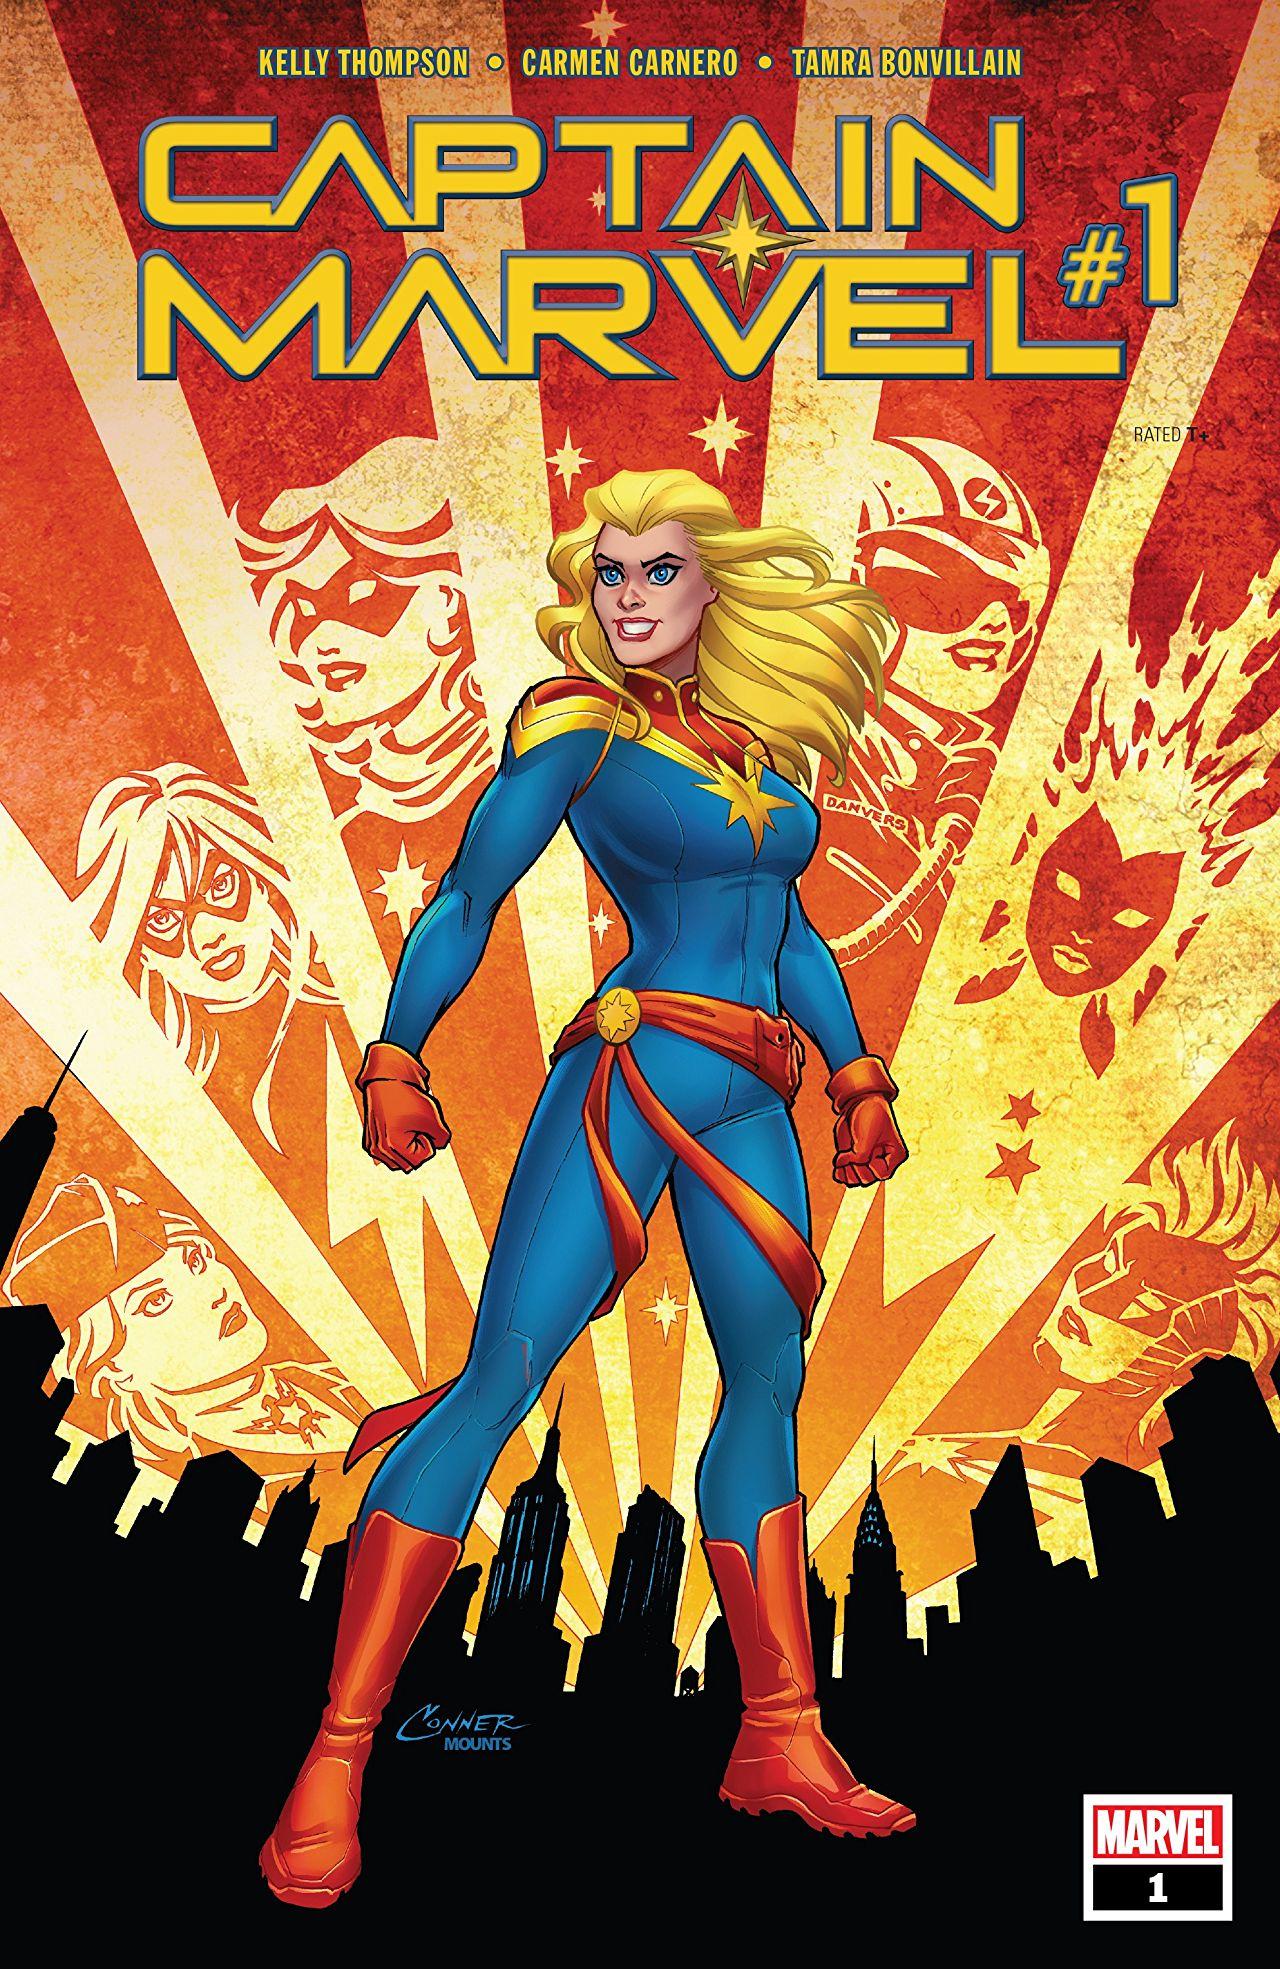 Staff Picks: Carol Danvers takes flight once more in 'Captain Marvel' #1